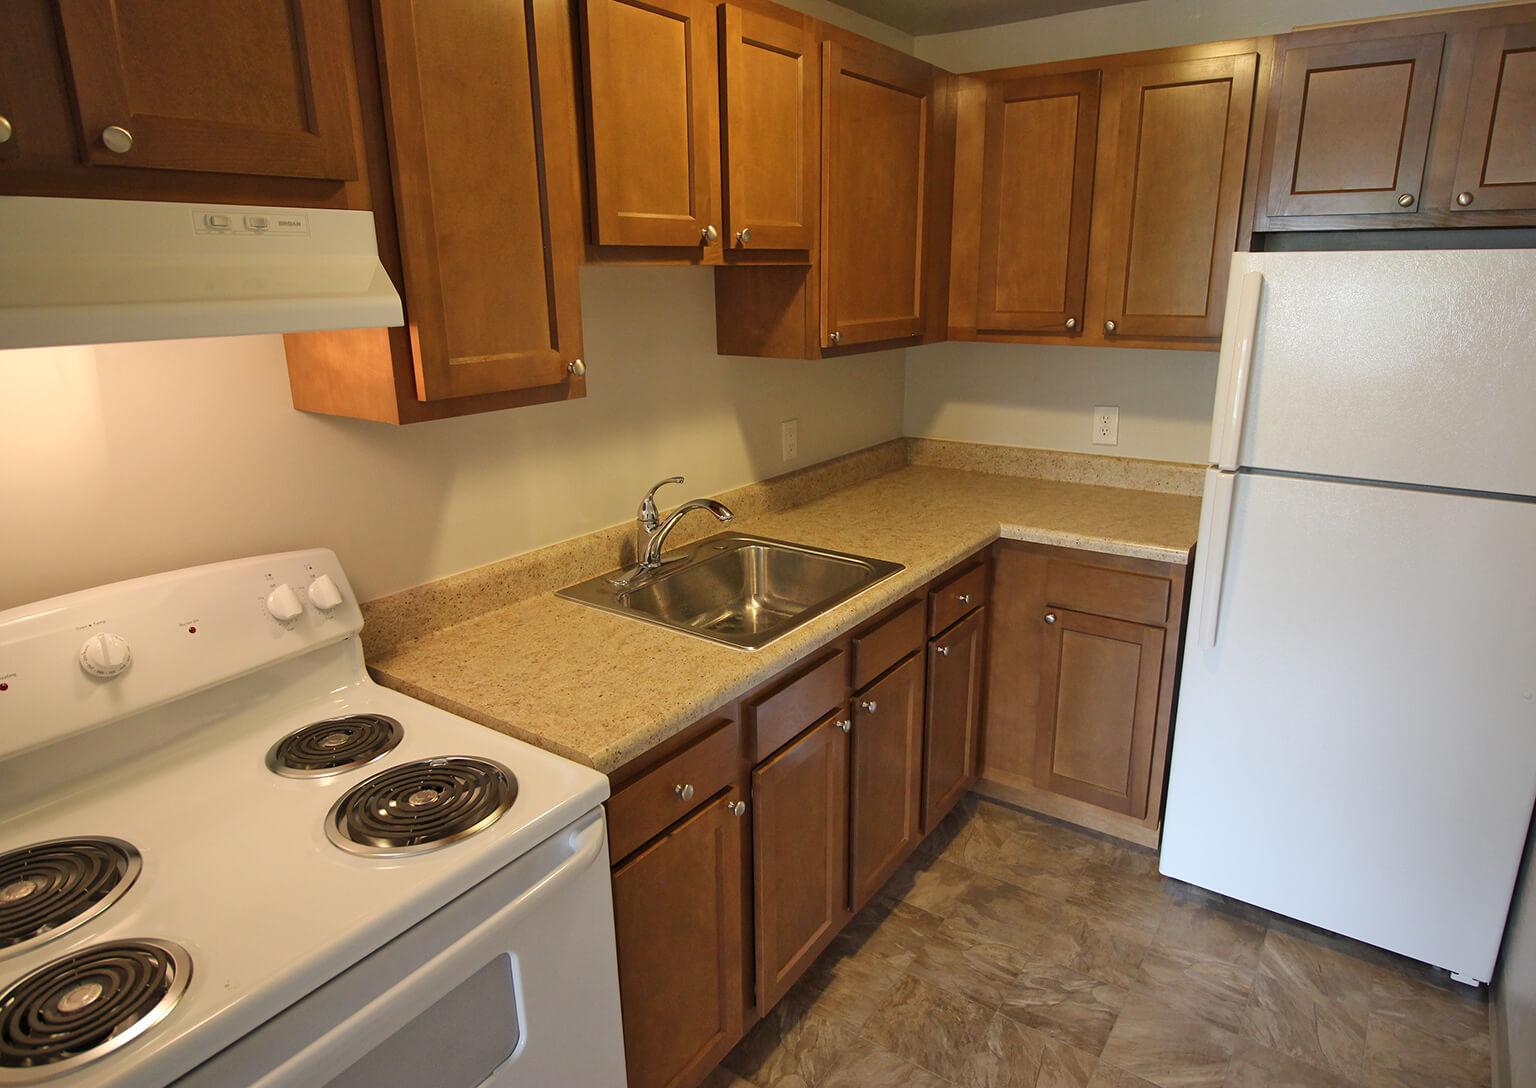 Valley View Apartments - Kitchen